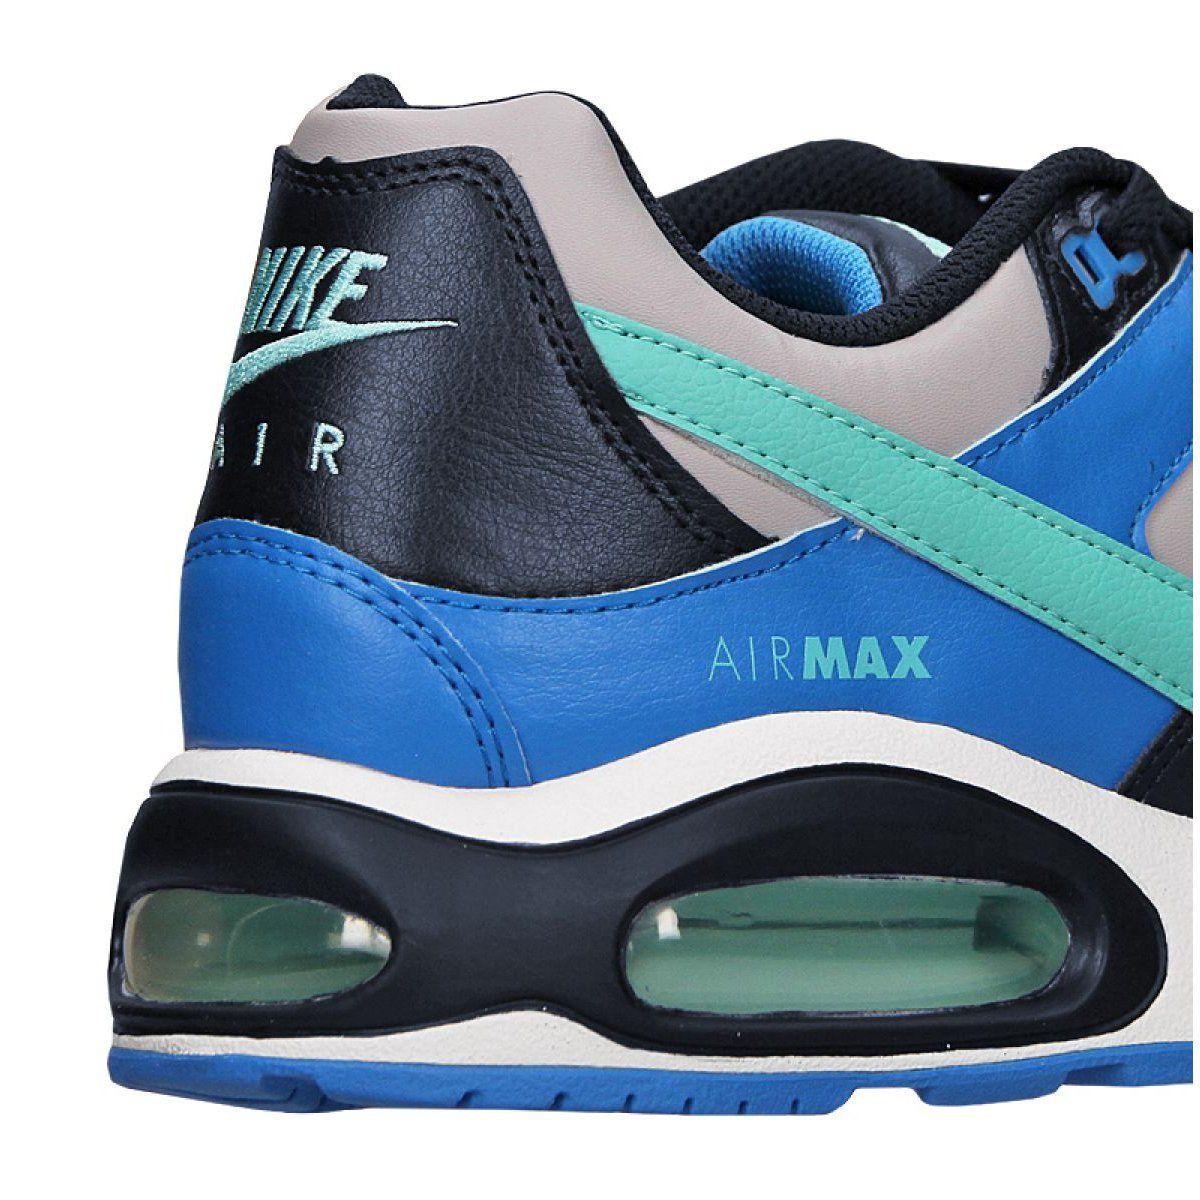 Buty Nike Air Max Command M 629993 050 Wielokolorowe Nike Air Max Command Nike Air Nike Air Max